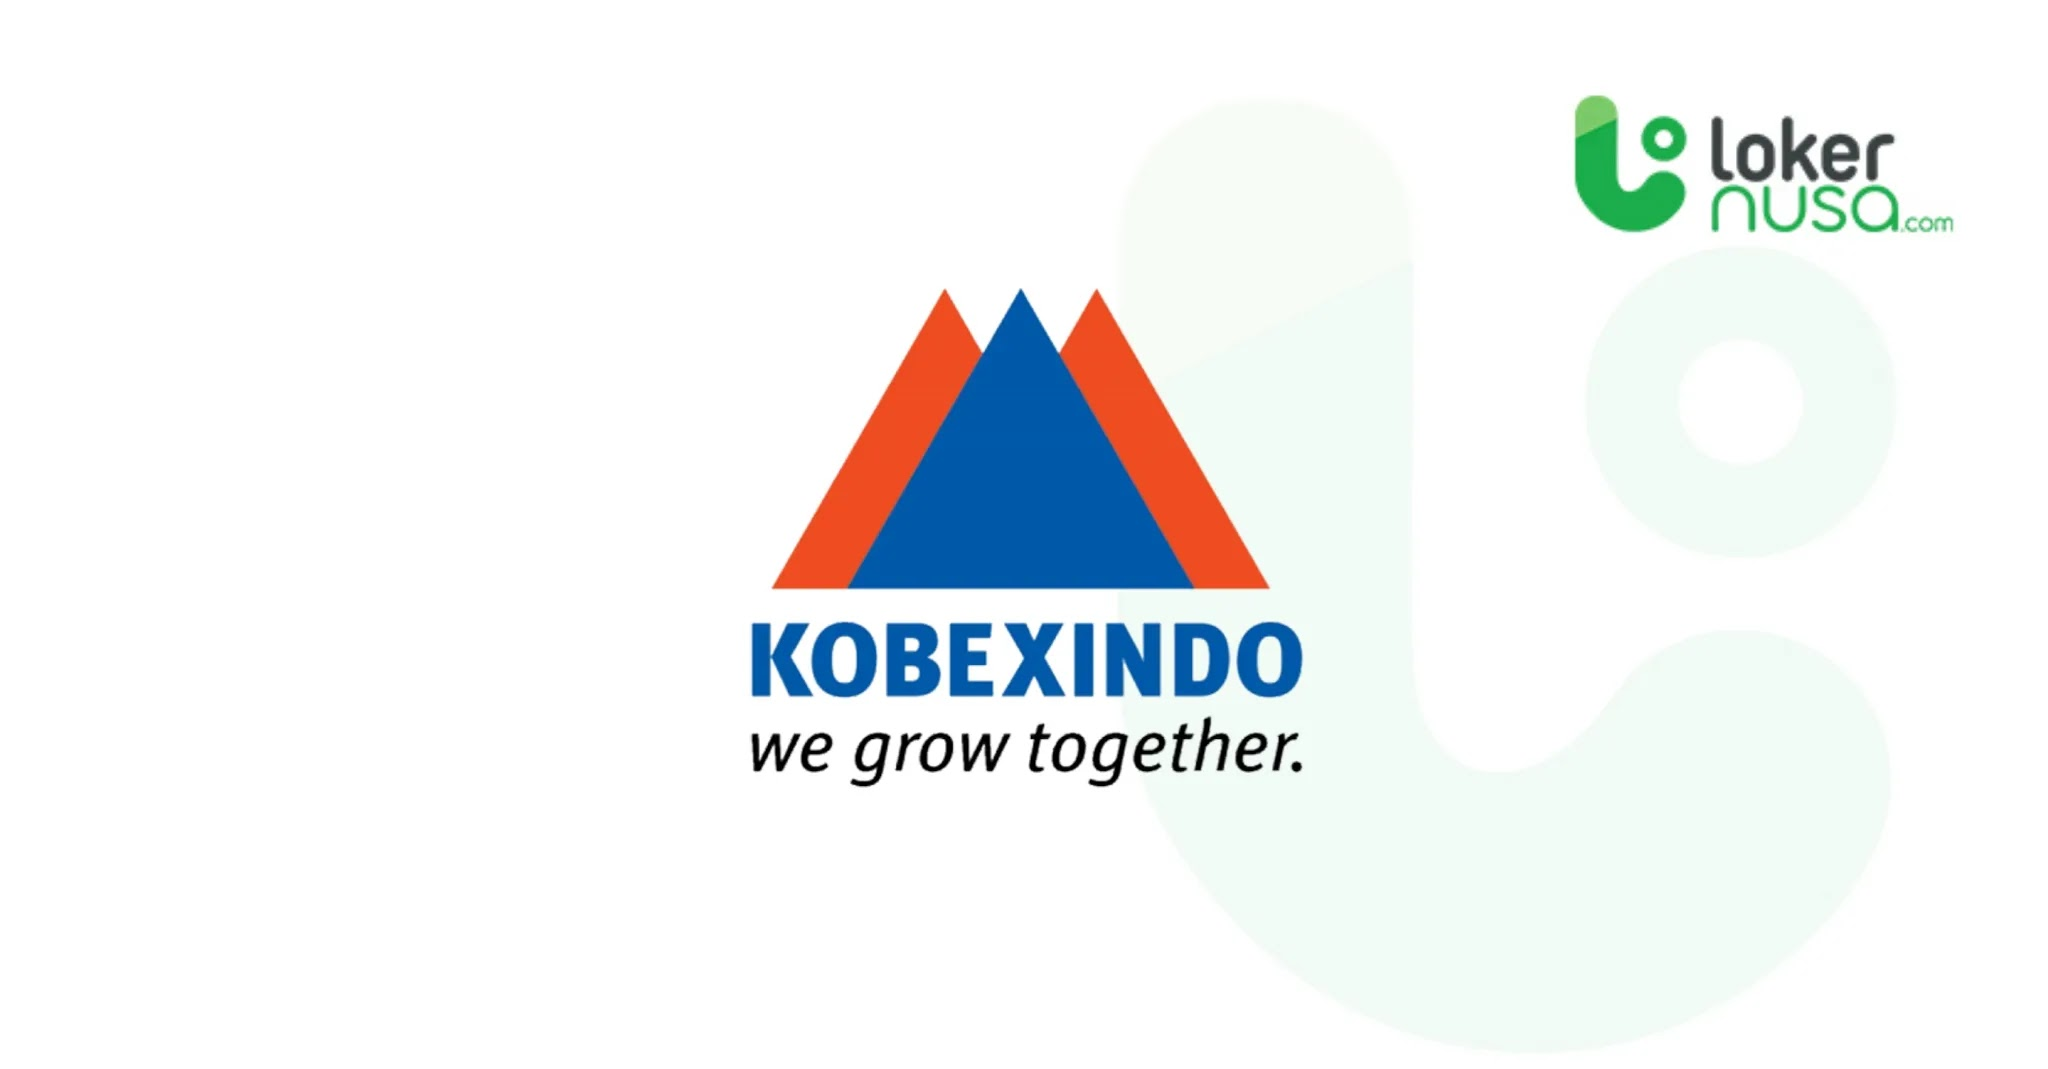 Lowongan Kerja Juli 2021 Kobexindo